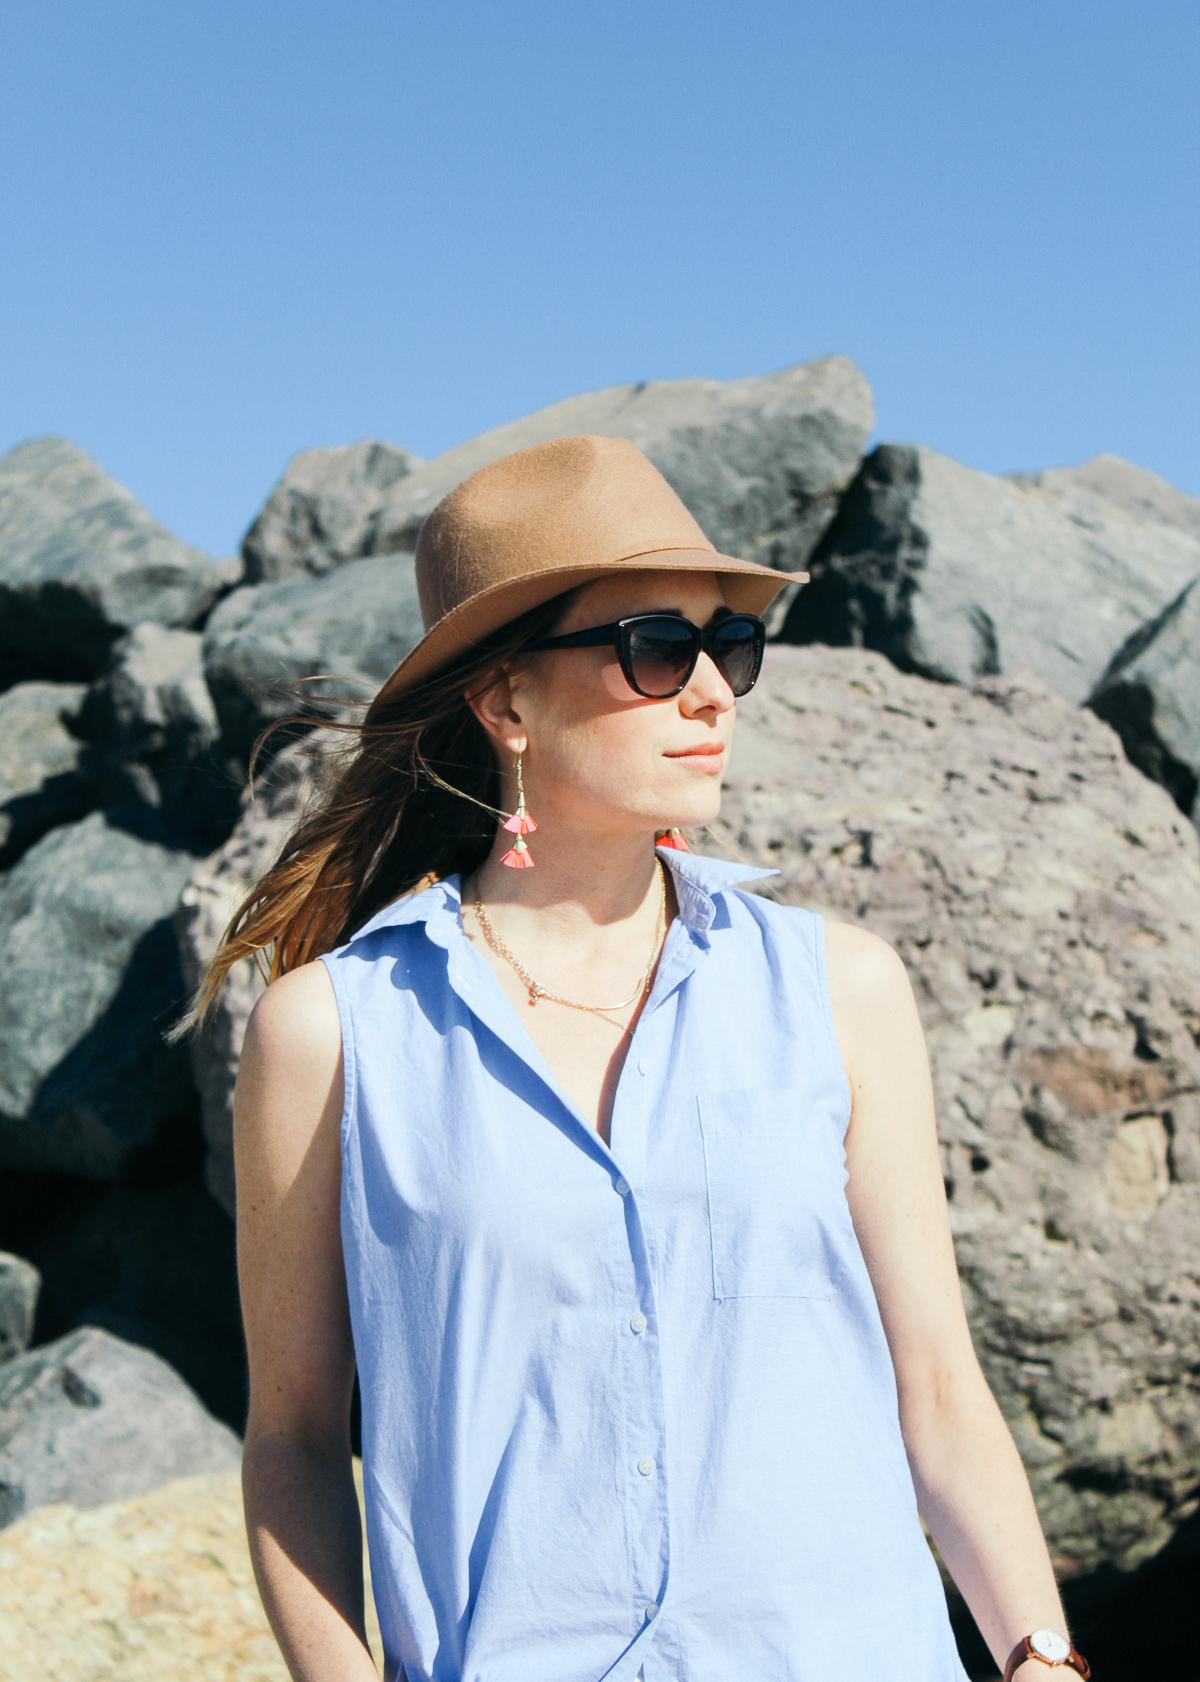 fringe earrings, felt hat, ted baker sunglasses, sunnies, fun earrings, statement earrings